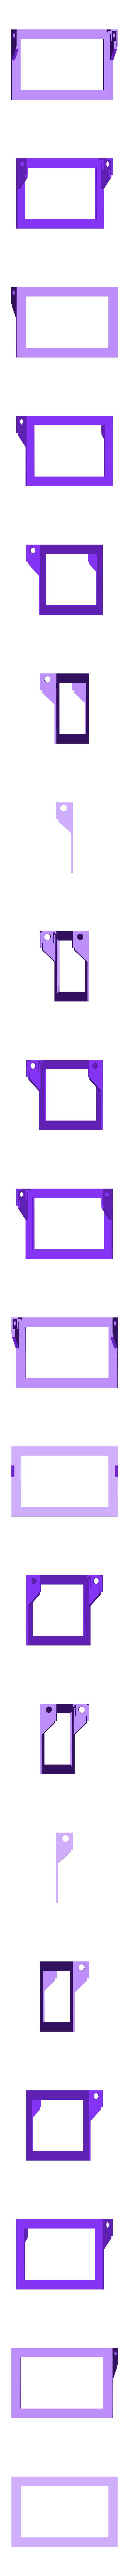 LogoCassette1_RectangularHole.stl Download free STL file Cassette Tape Case with Customizable Logos / Album Art • 3D printable model, tonyyoungblood